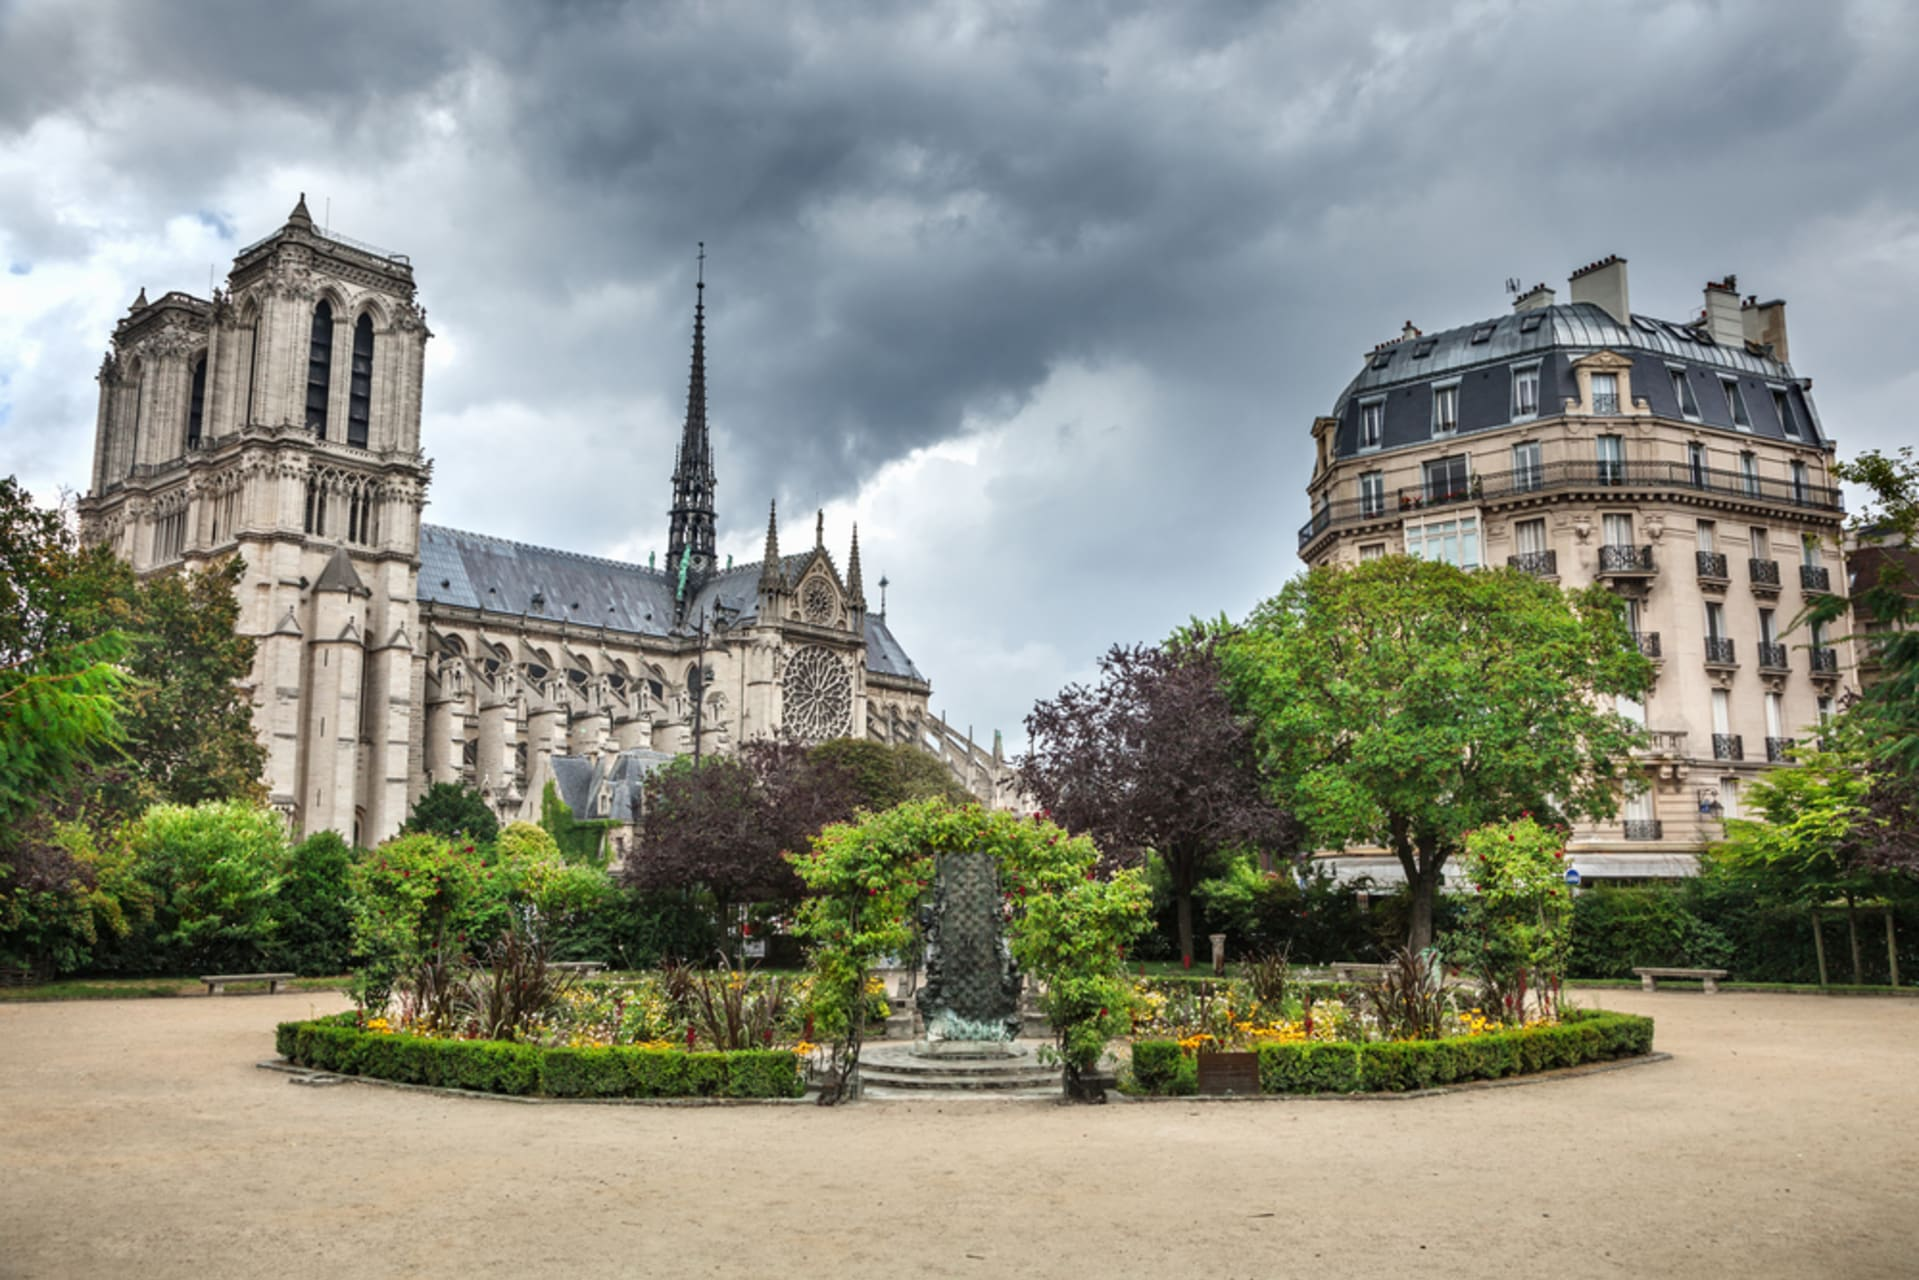 Paris - The Masters of Anglo-Saxon literature in Paris - Part II